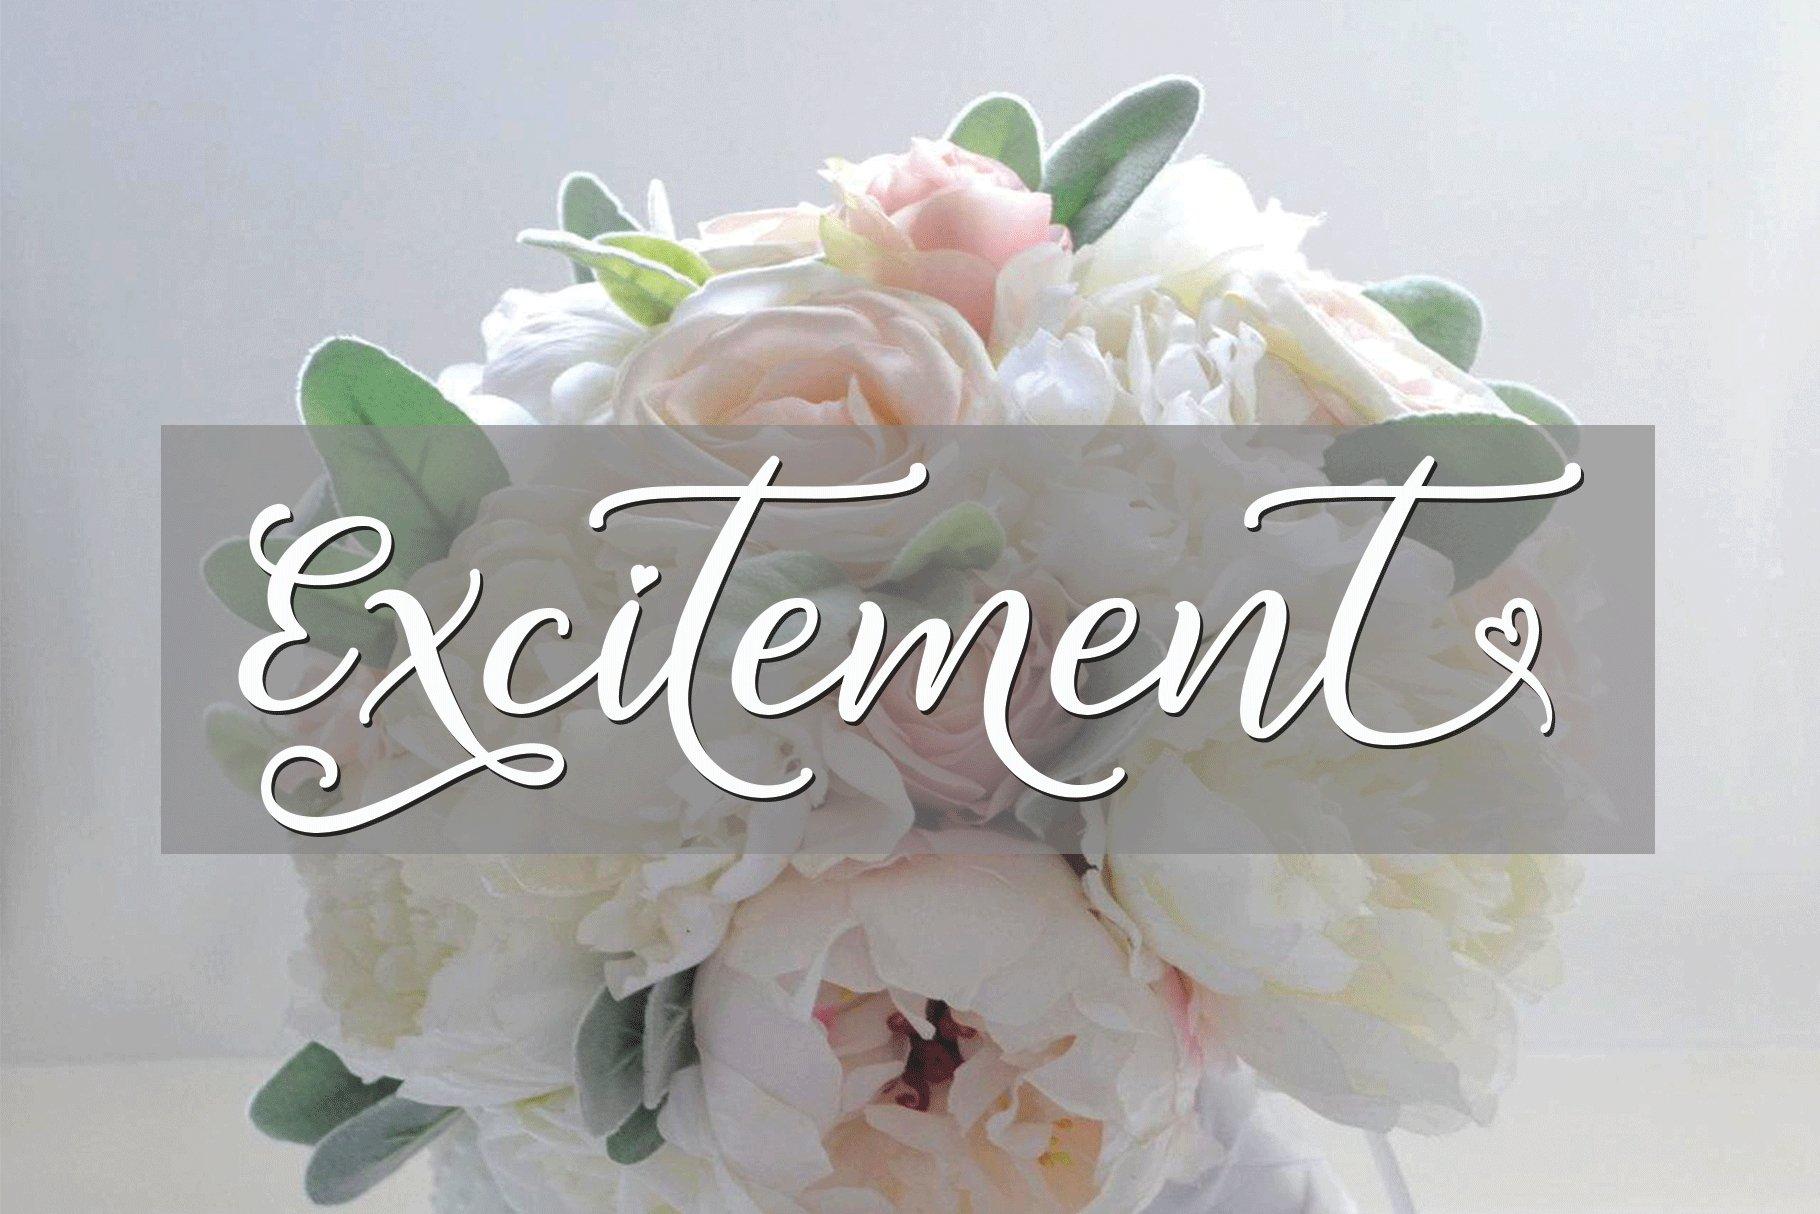 Excitement example image 5